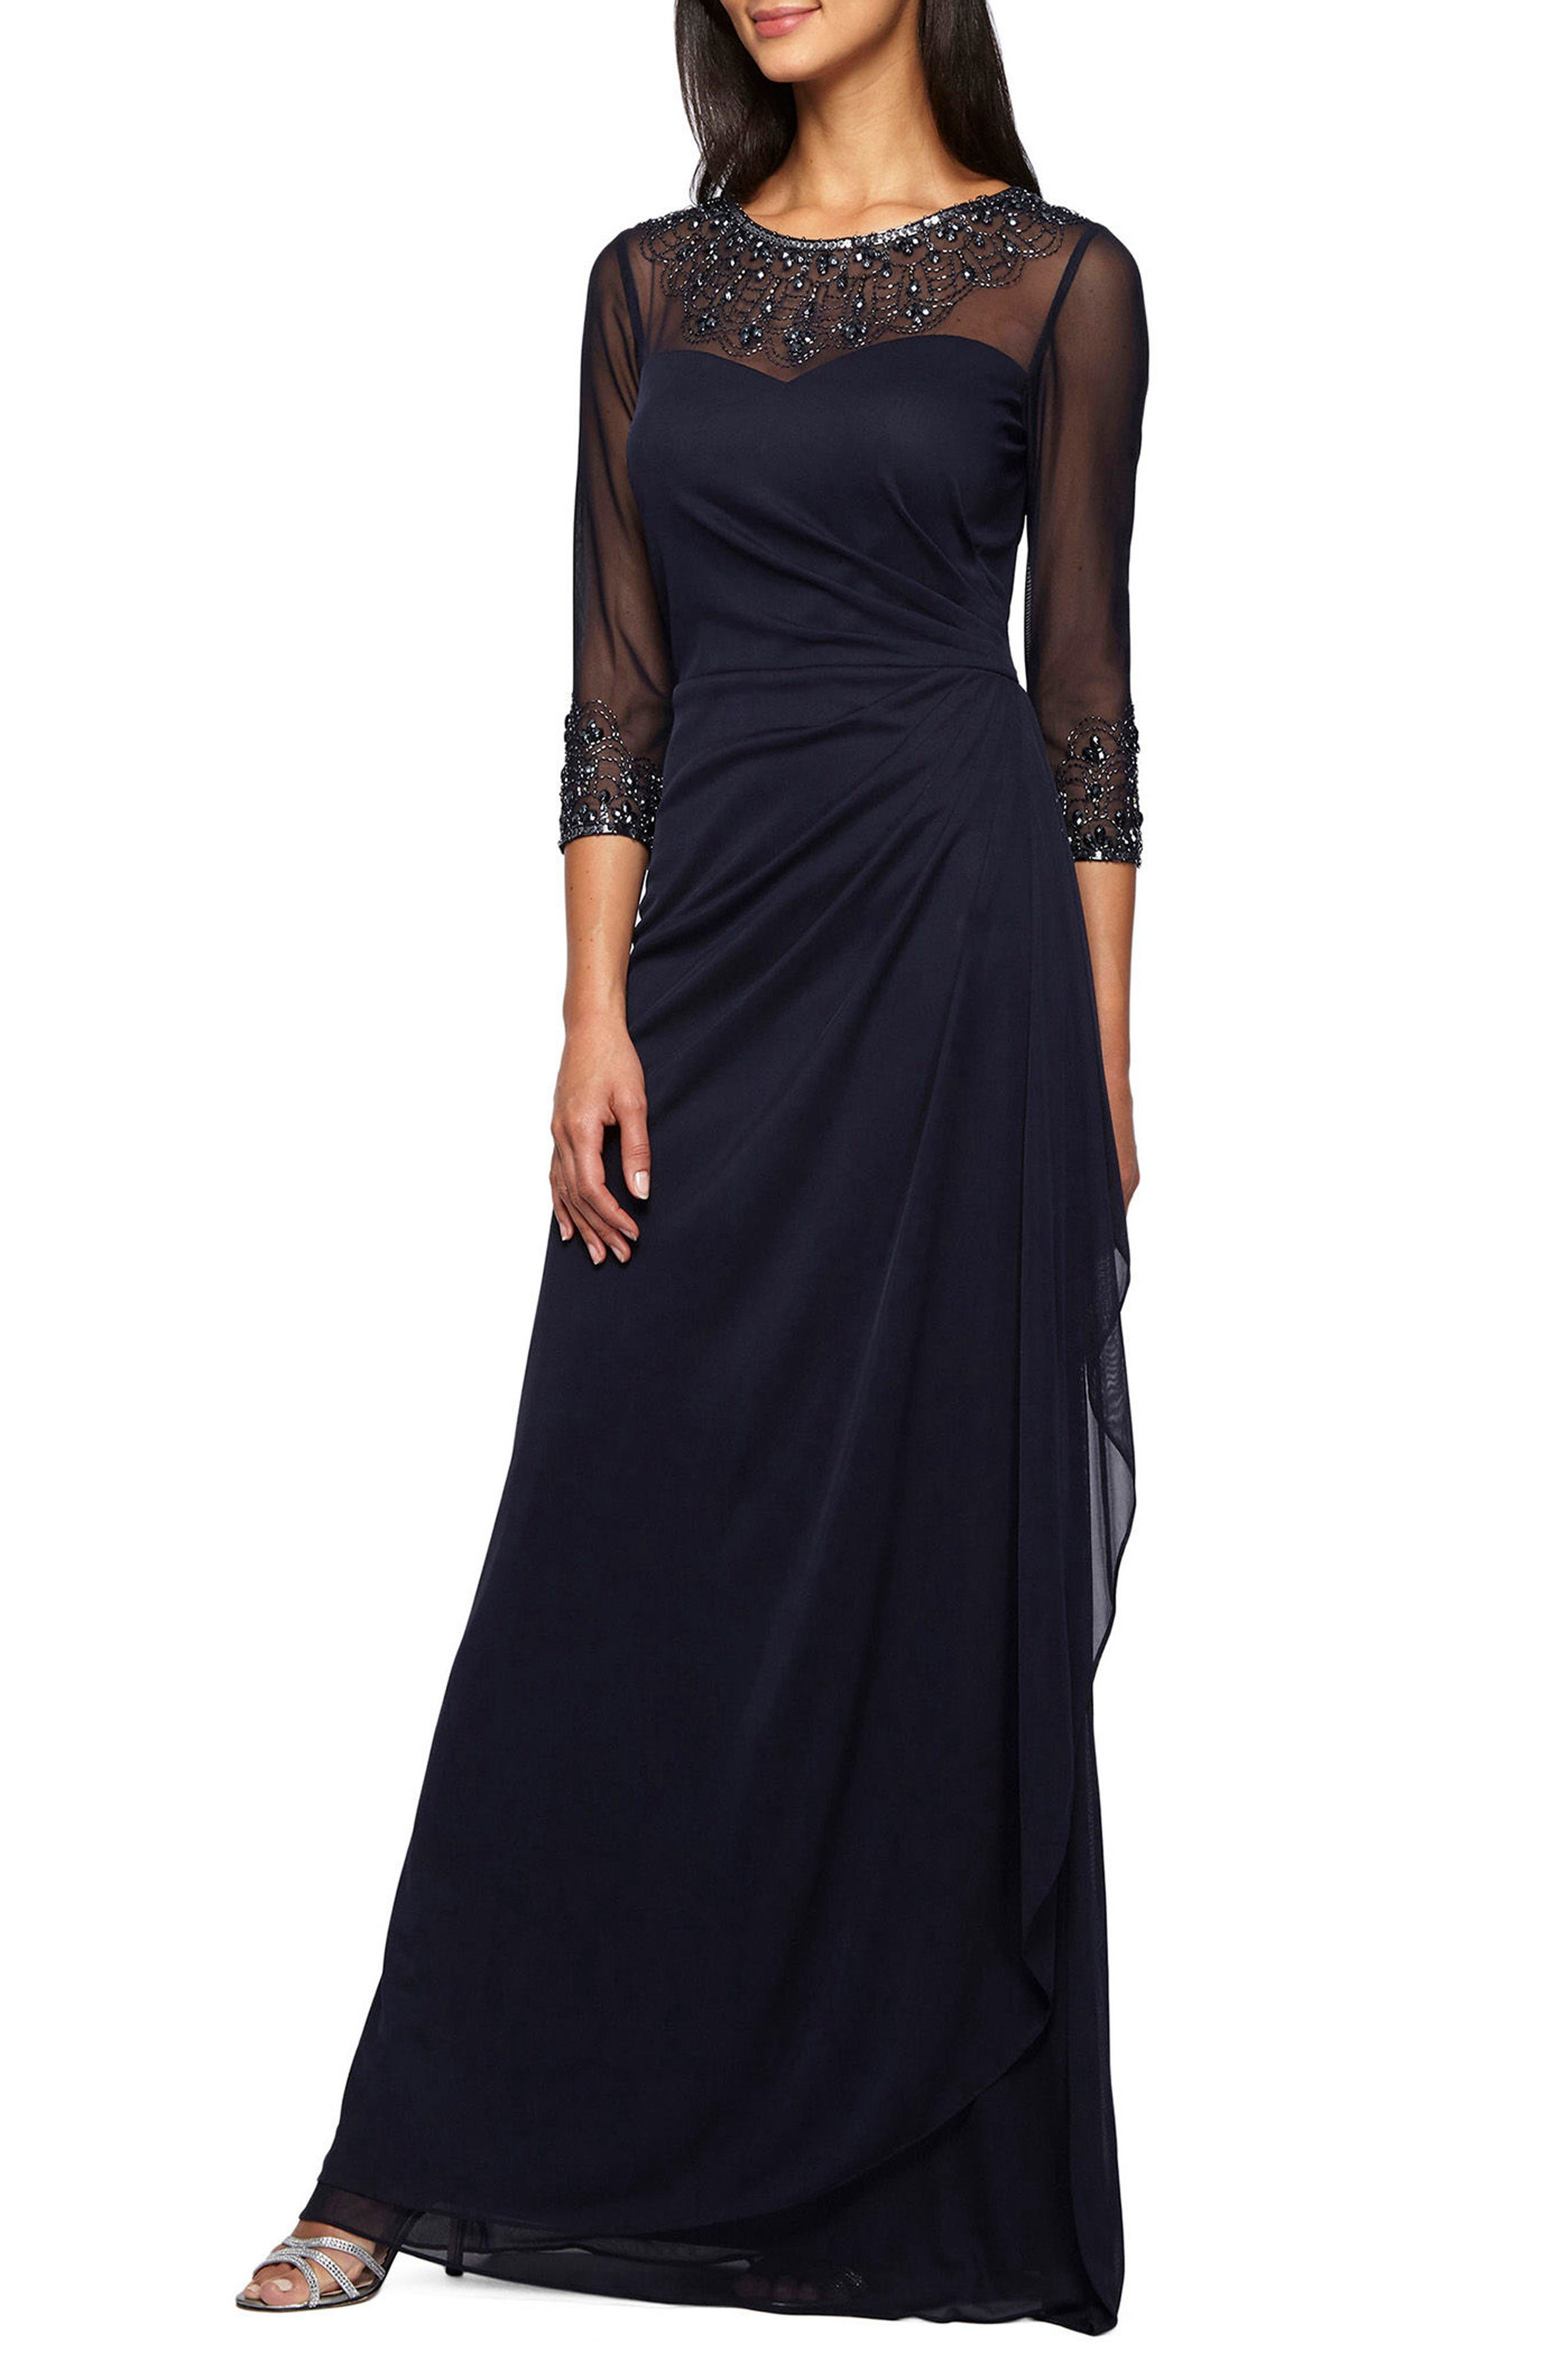 Alternate Image 1 Selected - Alex Evenings Embellished A-Line Gown (Regular & Petite)